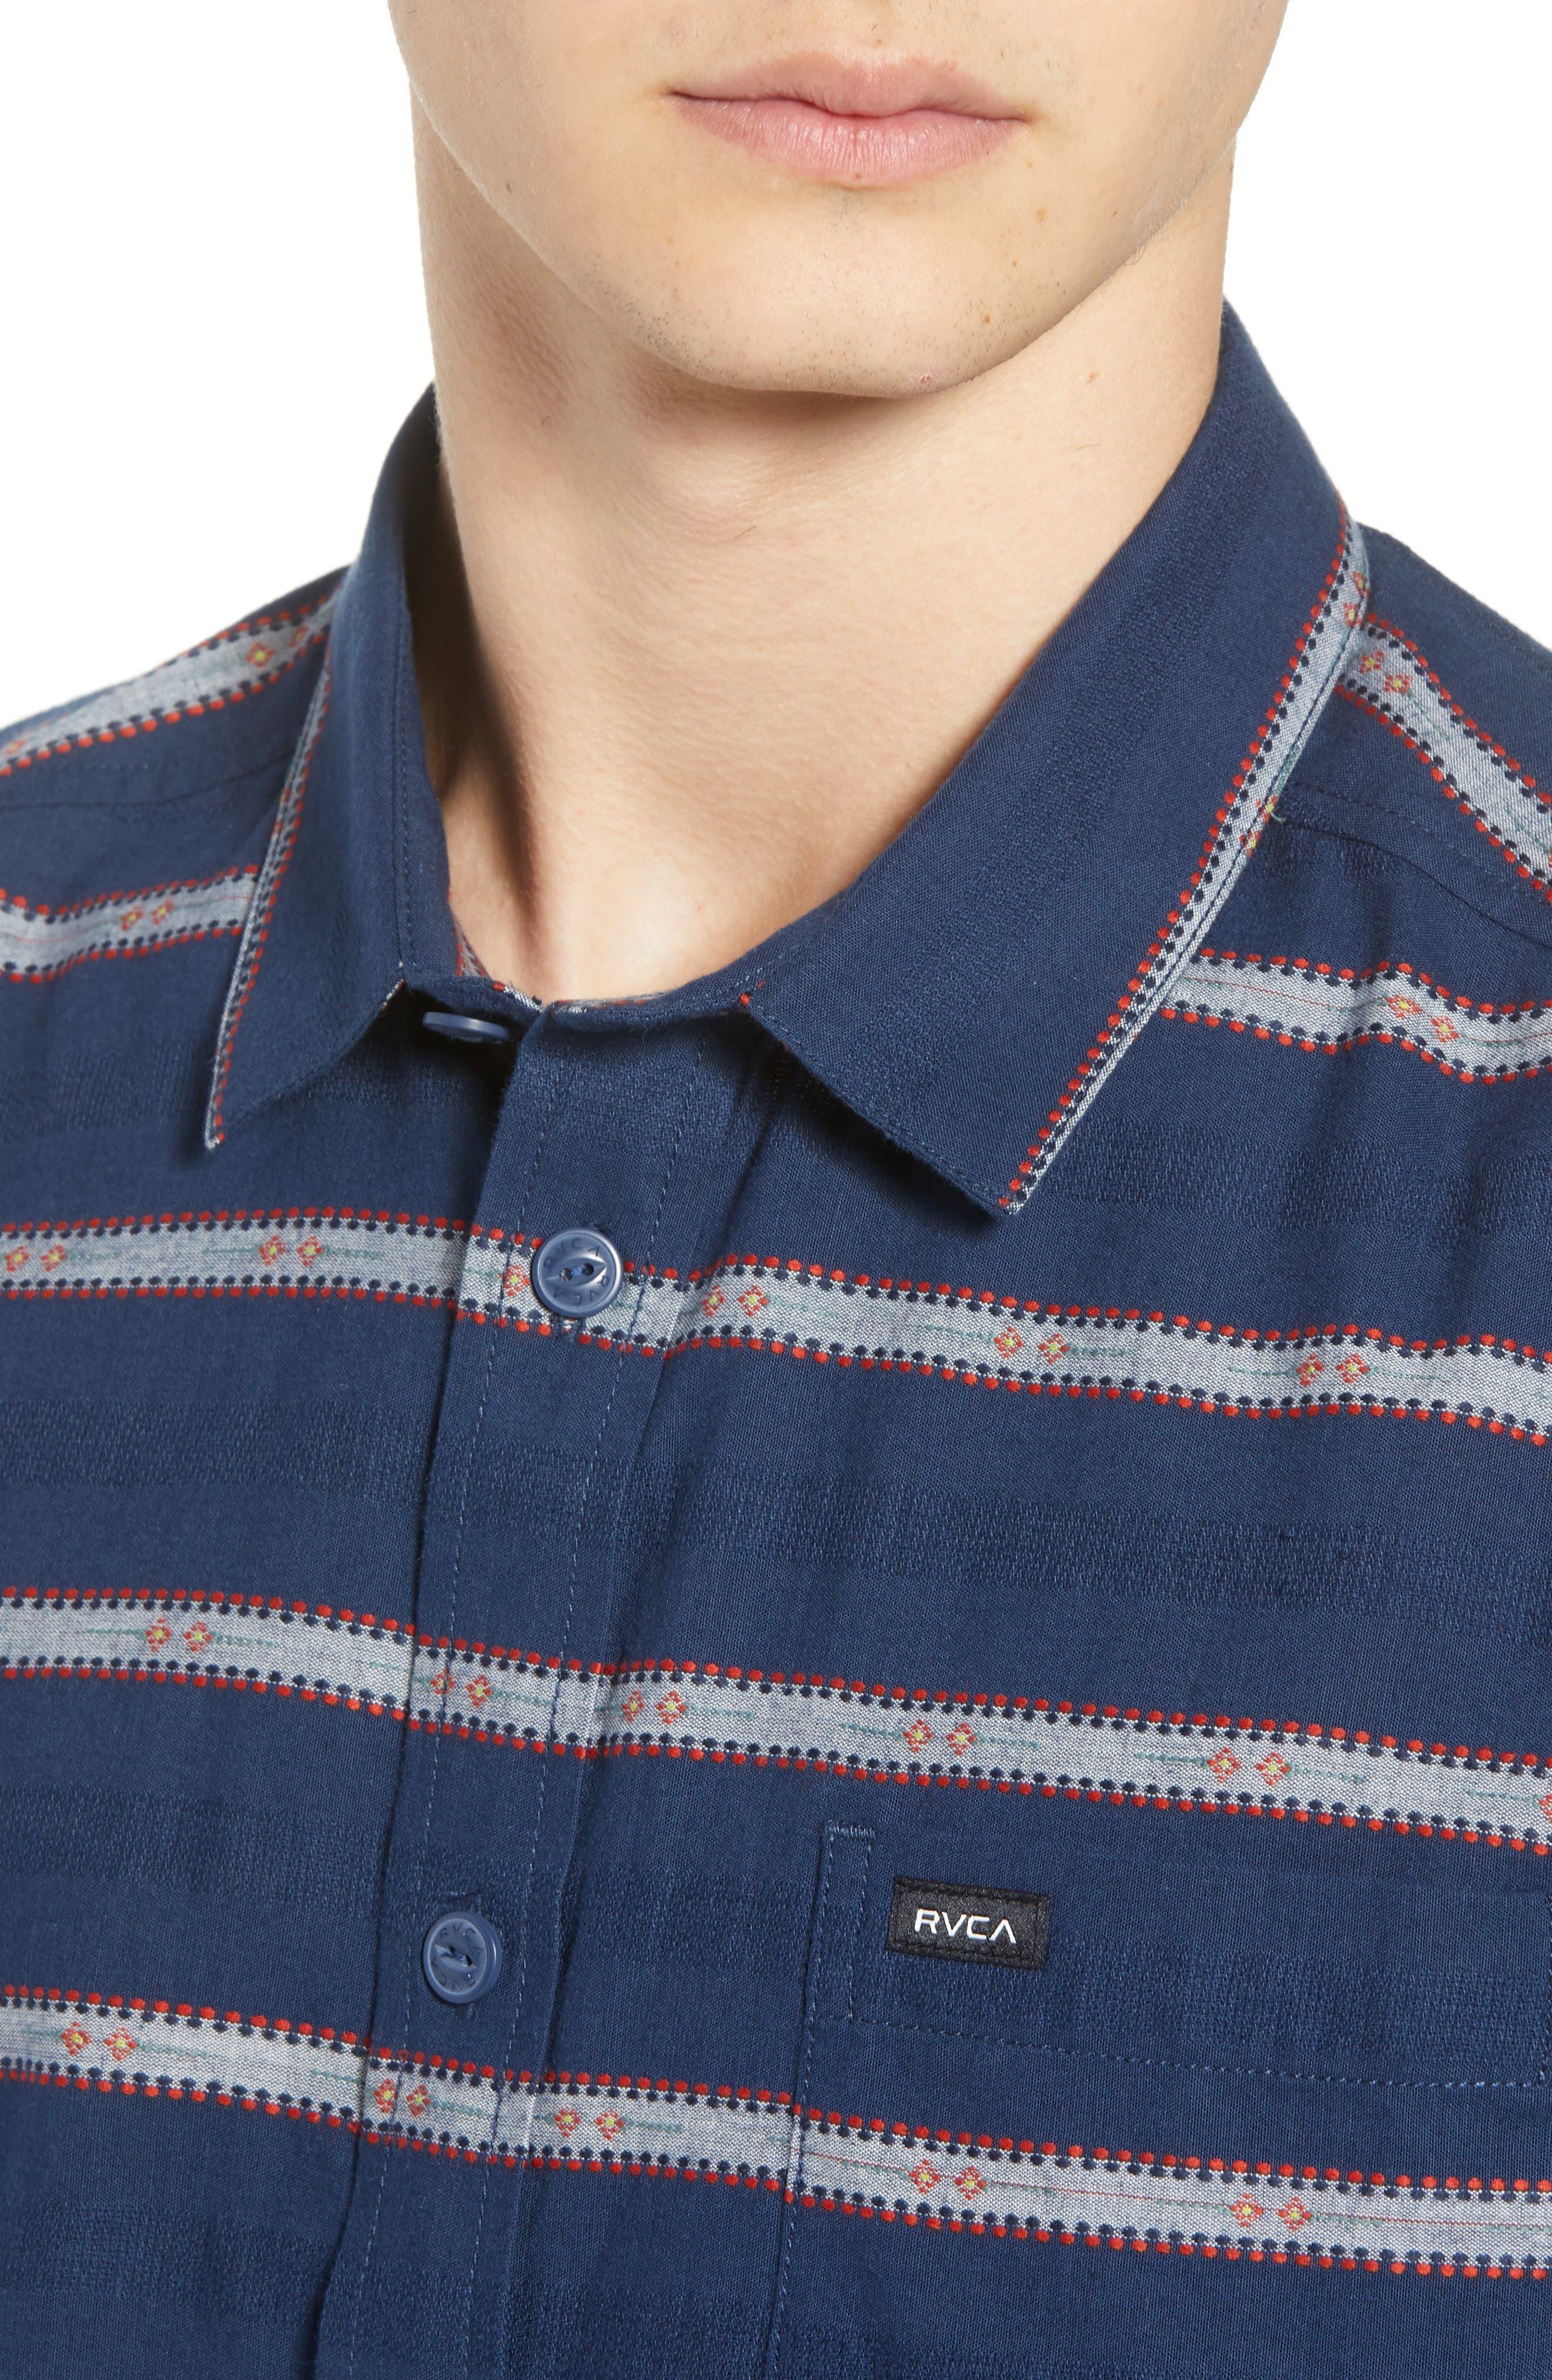 Outer Sunset Woven Shirt,                             Alternate thumbnail 4, color,                             487